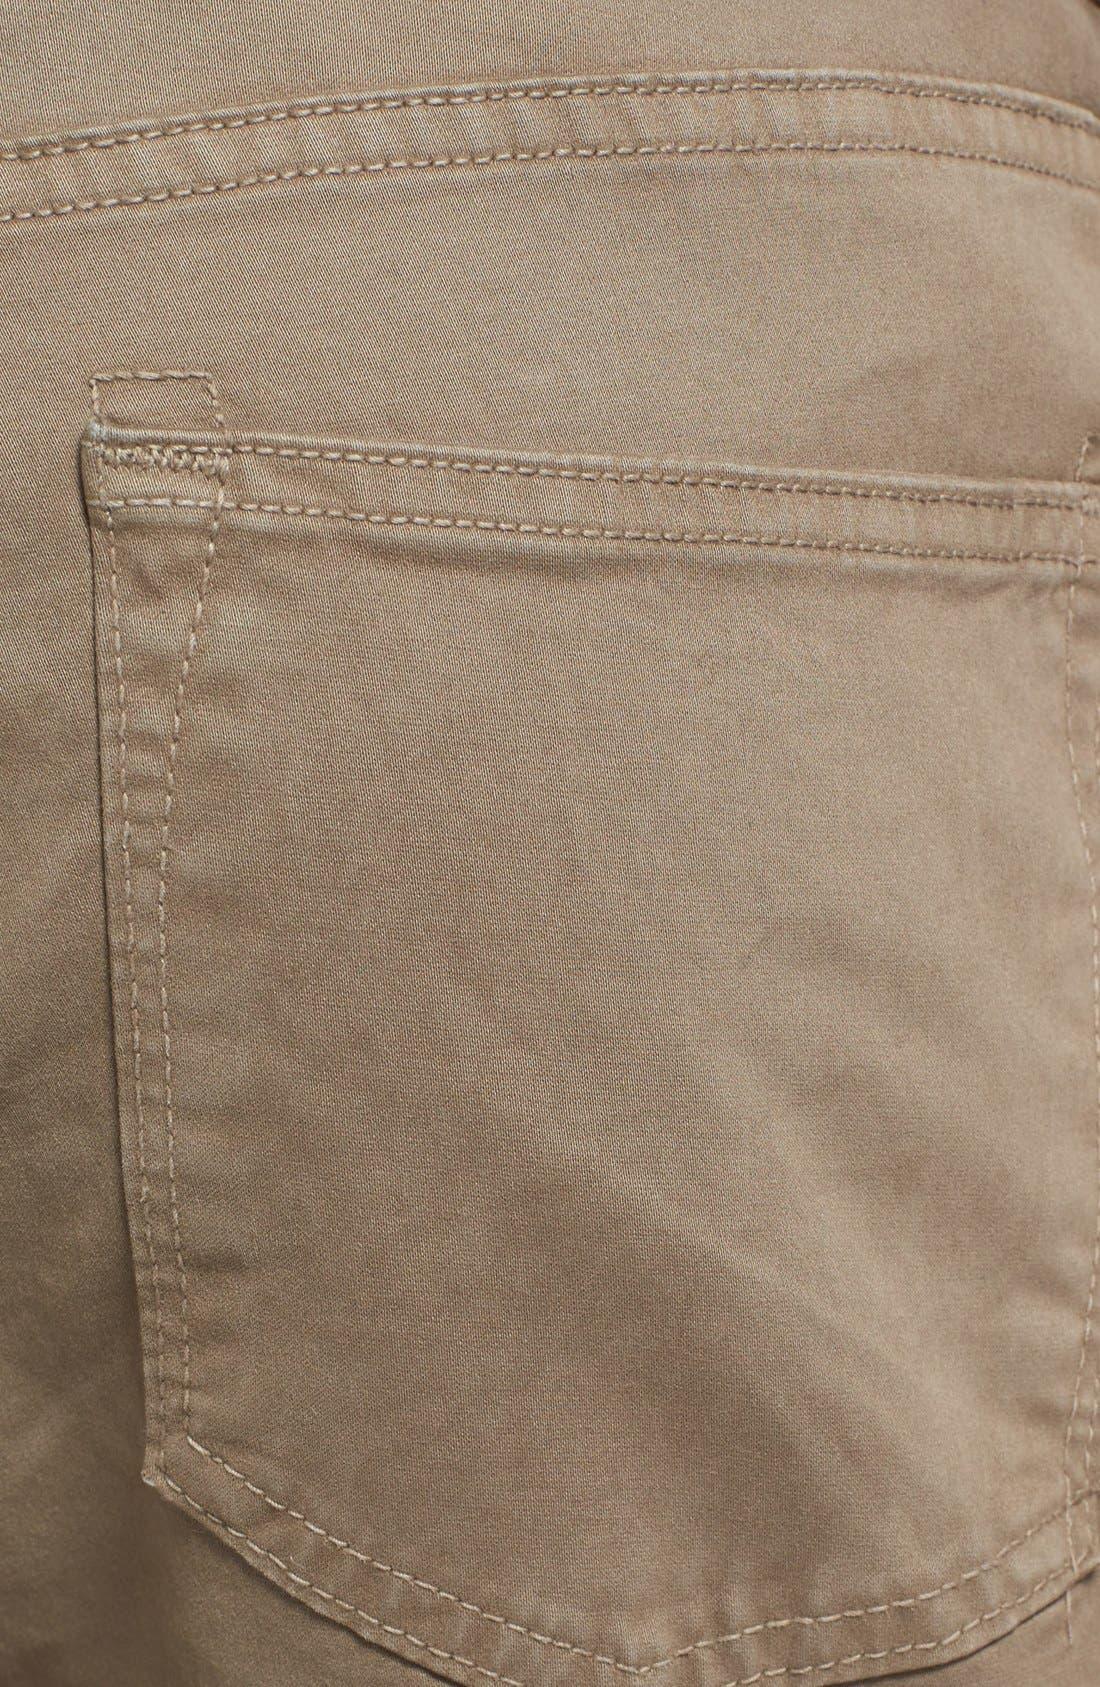 'Kane' Slim Fit Cotton Twill Pants,                             Alternate thumbnail 32, color,